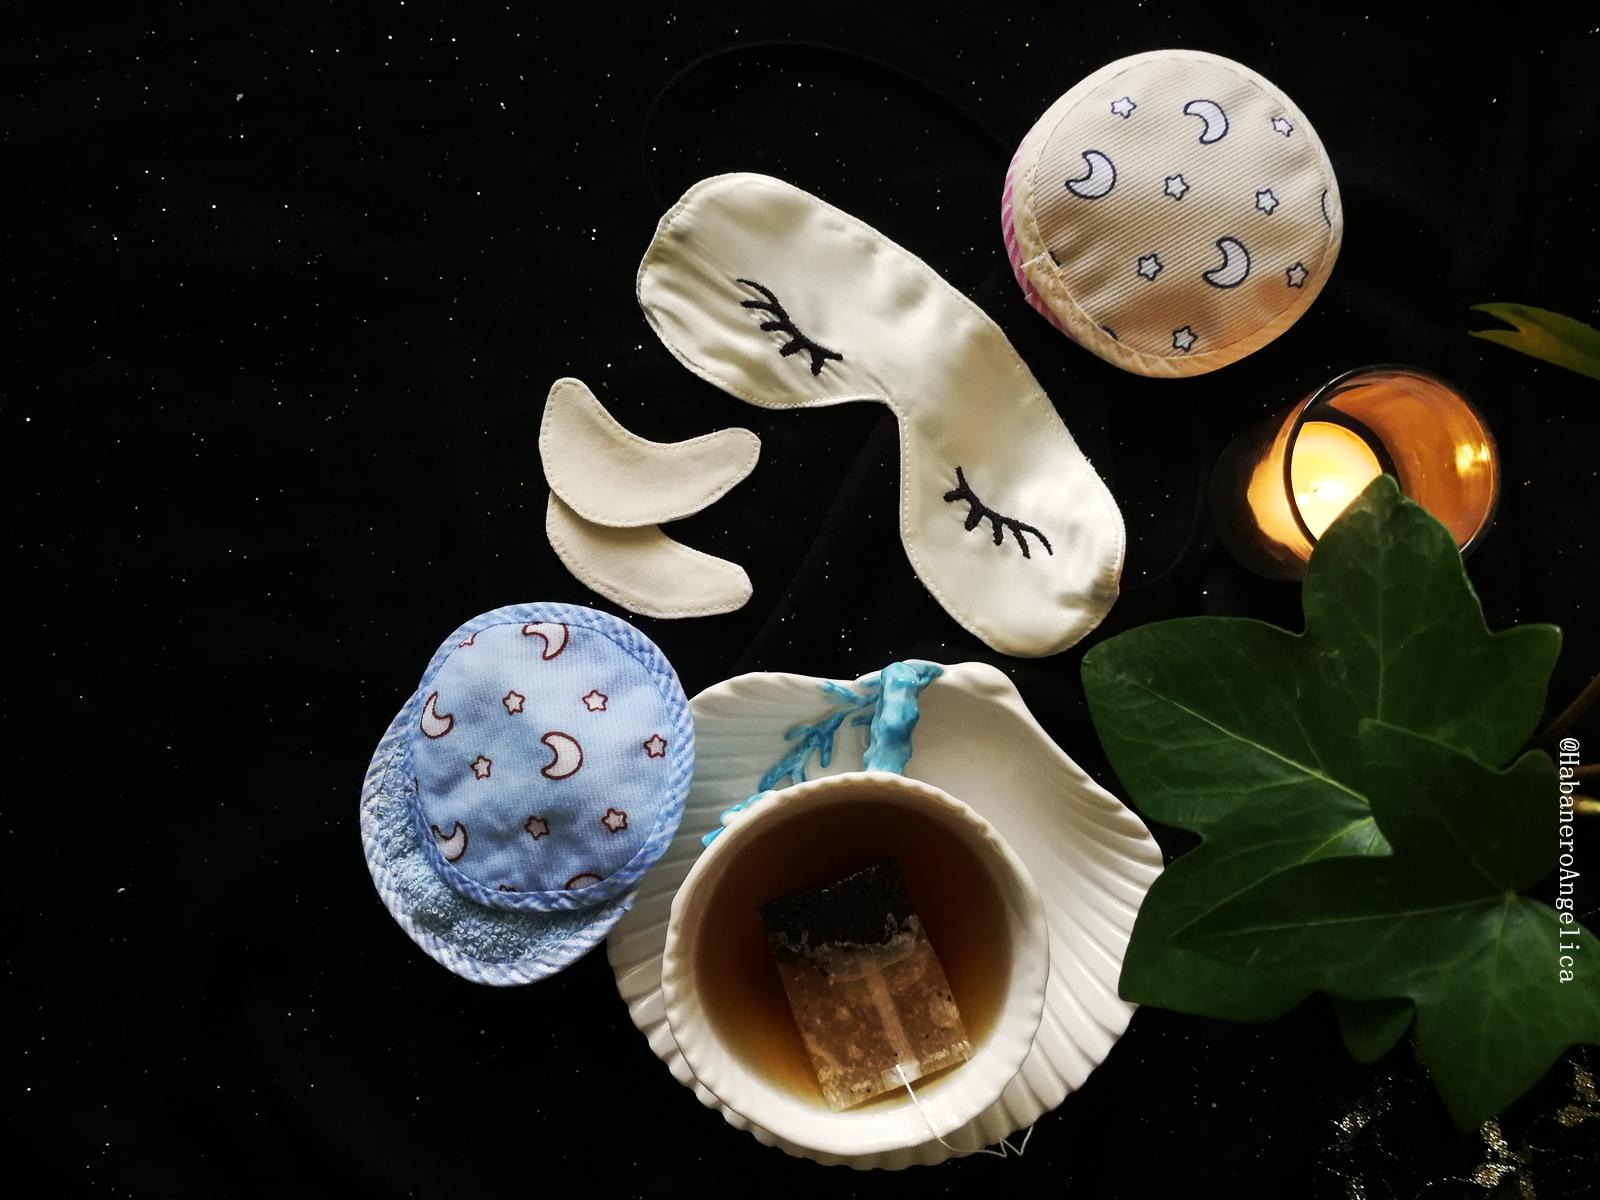 Beauty Things Handmade Etsy acquisti etici